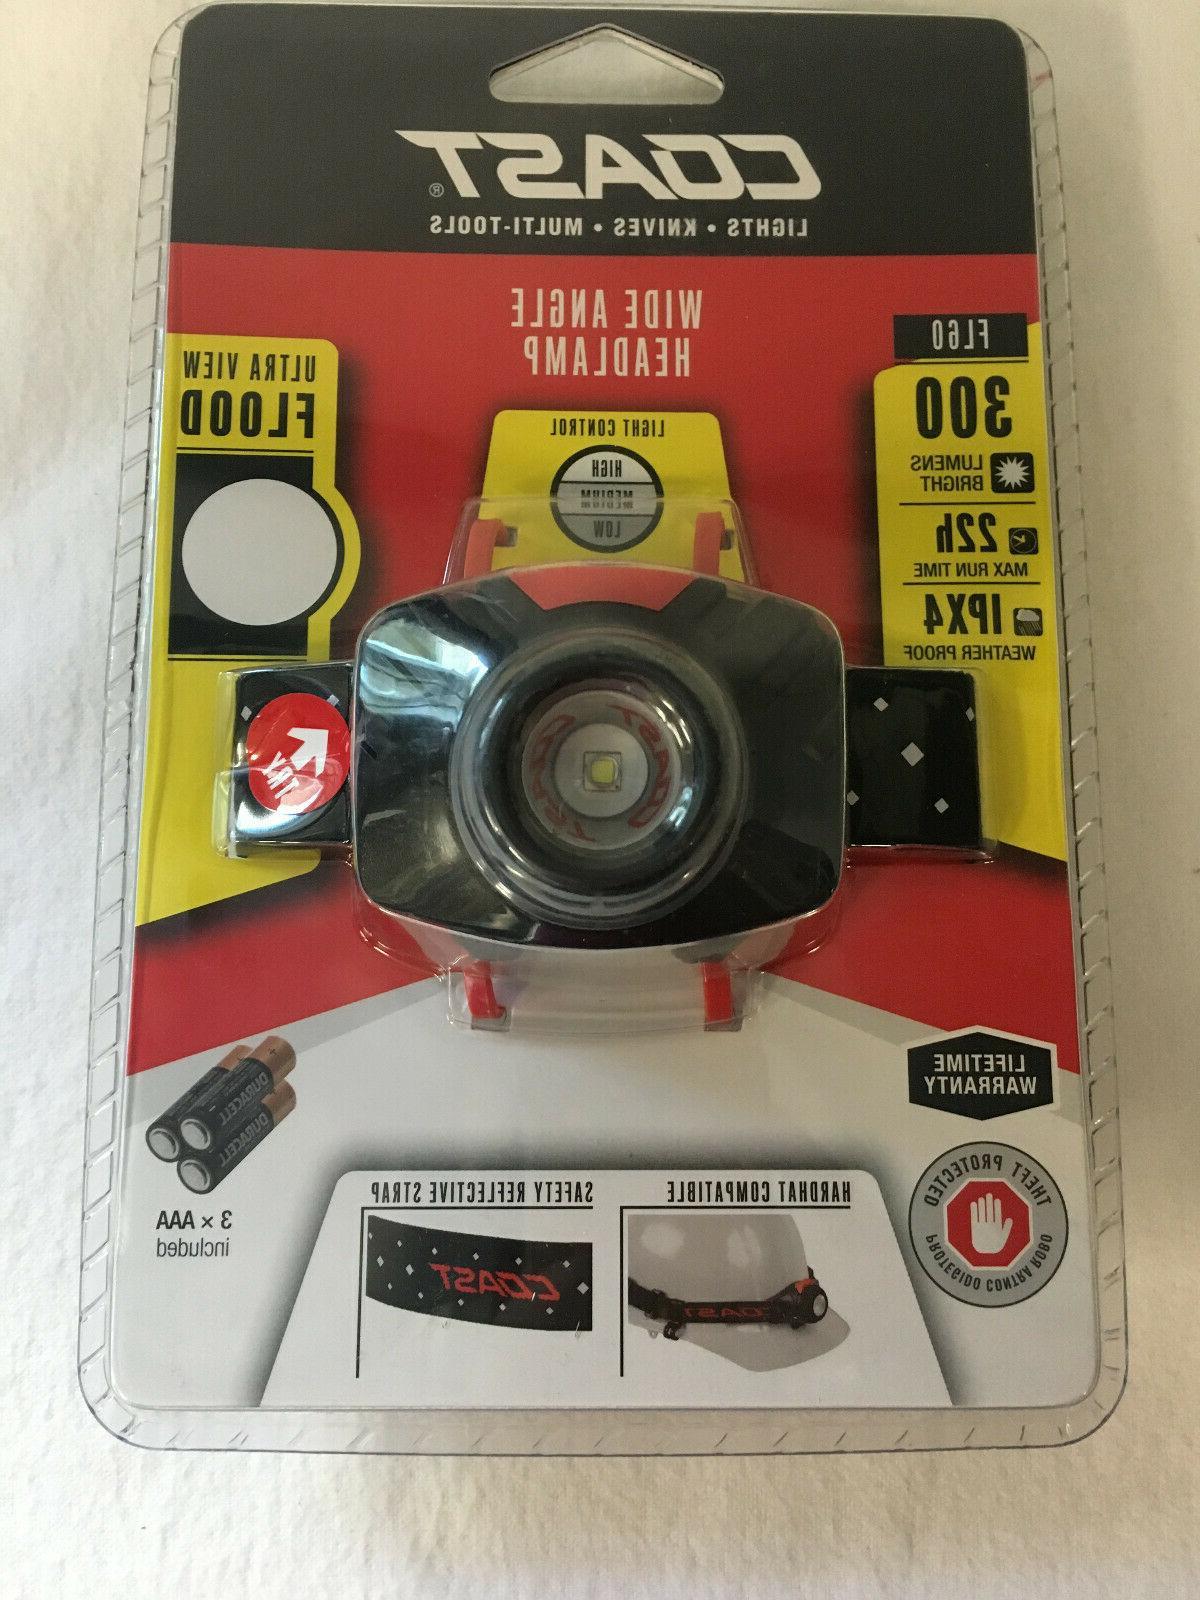 fl60 headlamp